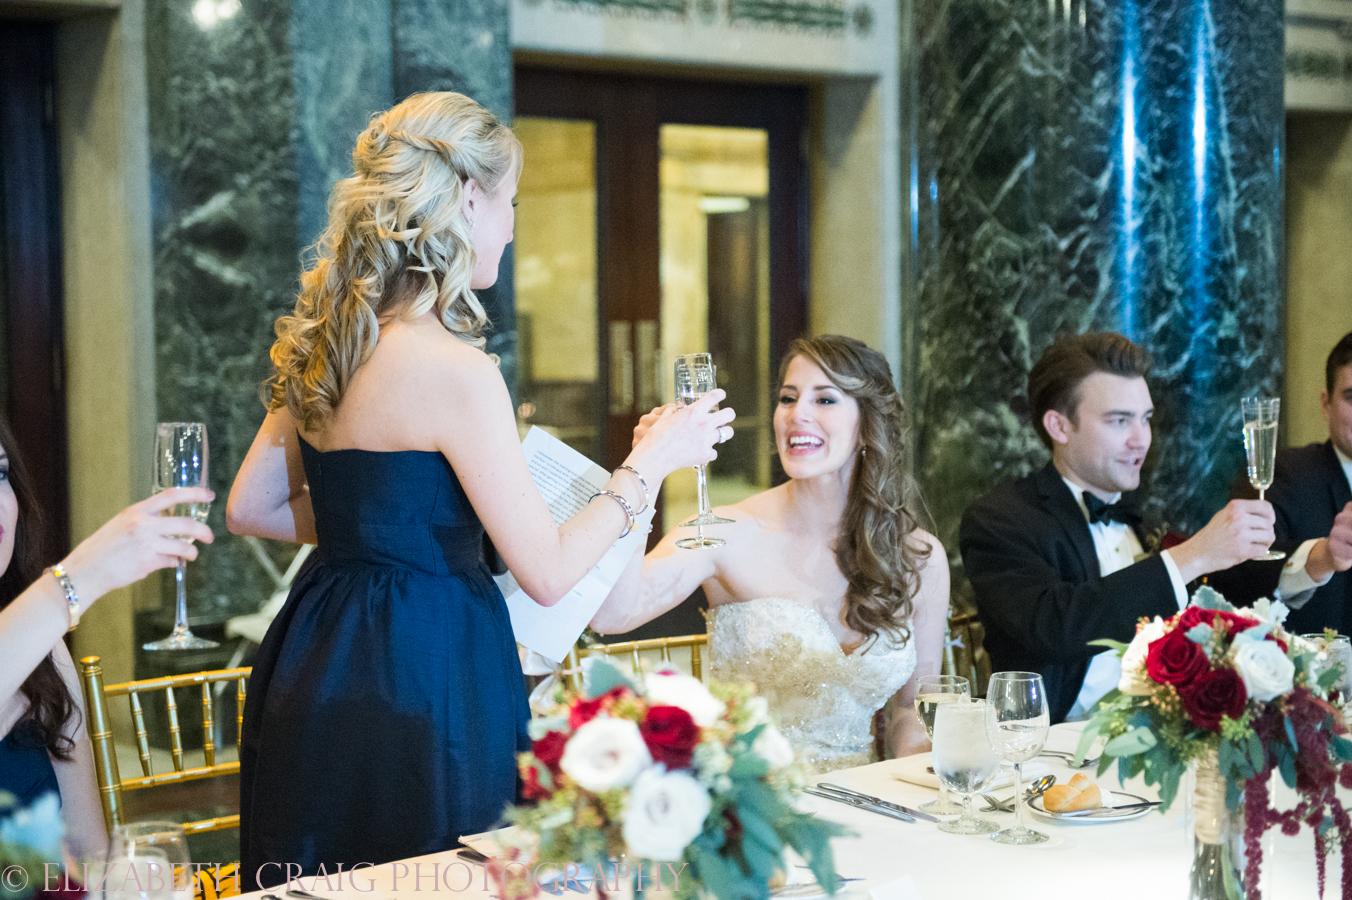 Carnegie Museum of Art Weddings | Elizabeth Craig Photography-0115